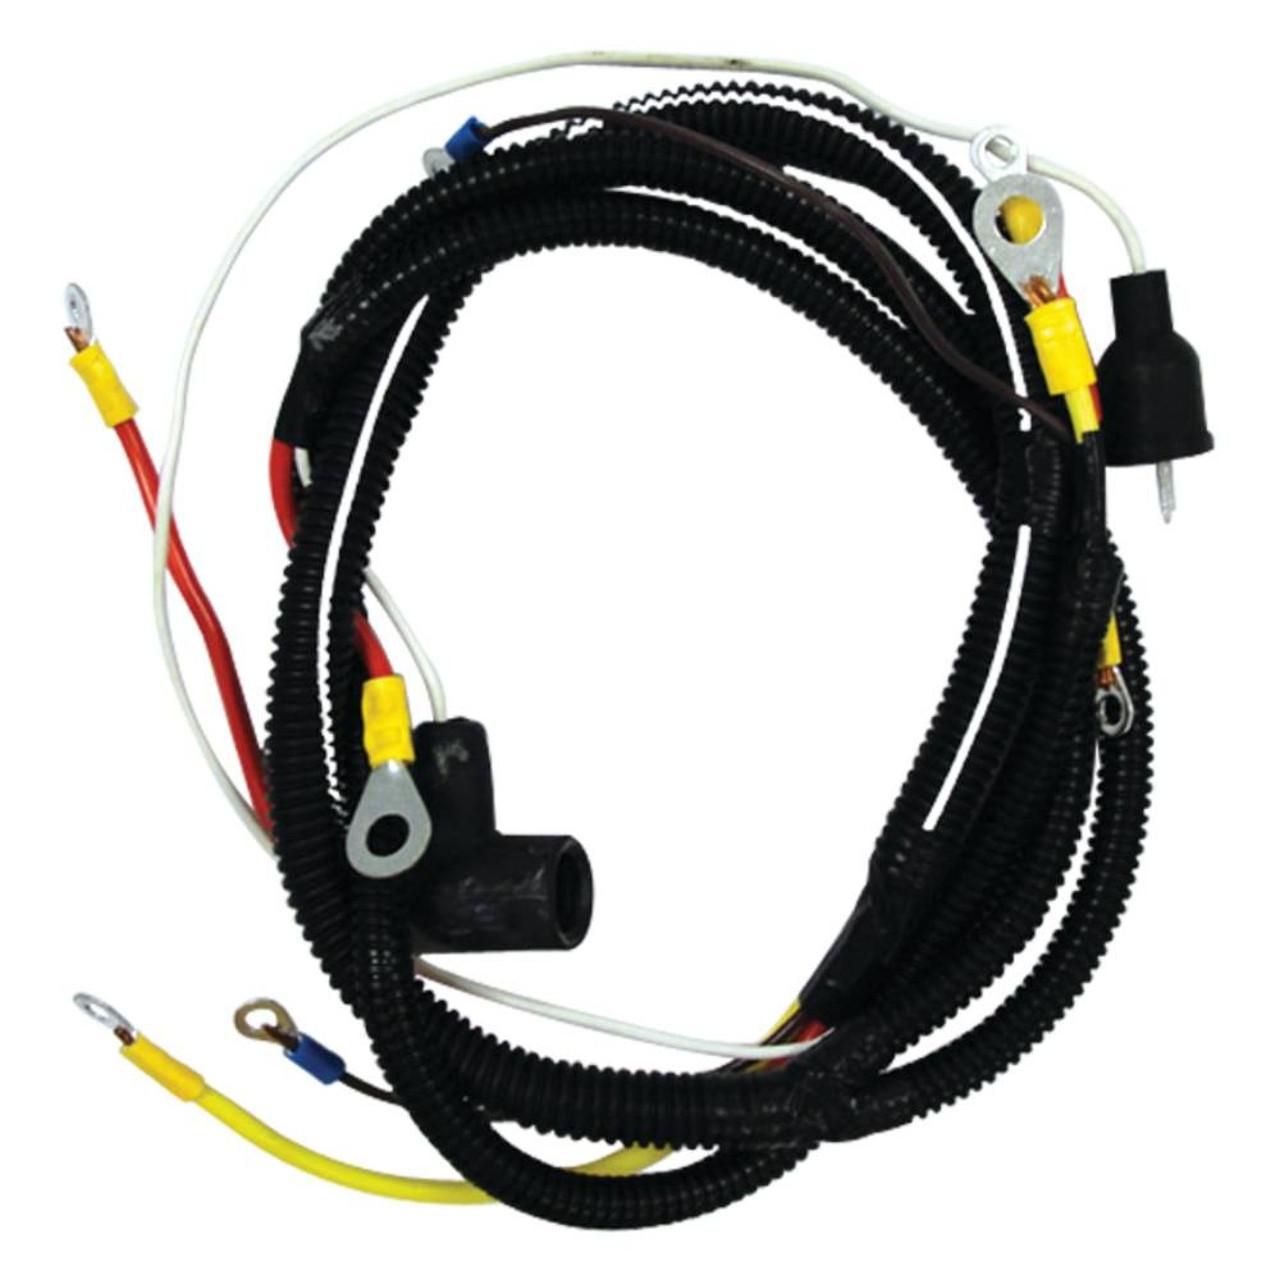 hight resolution of 2n 8n front dist tractor 12v alt alternator wiring harness 8ne10301 2n 8n front dist tractor 12v alt alternator wiring harness 8ne10301